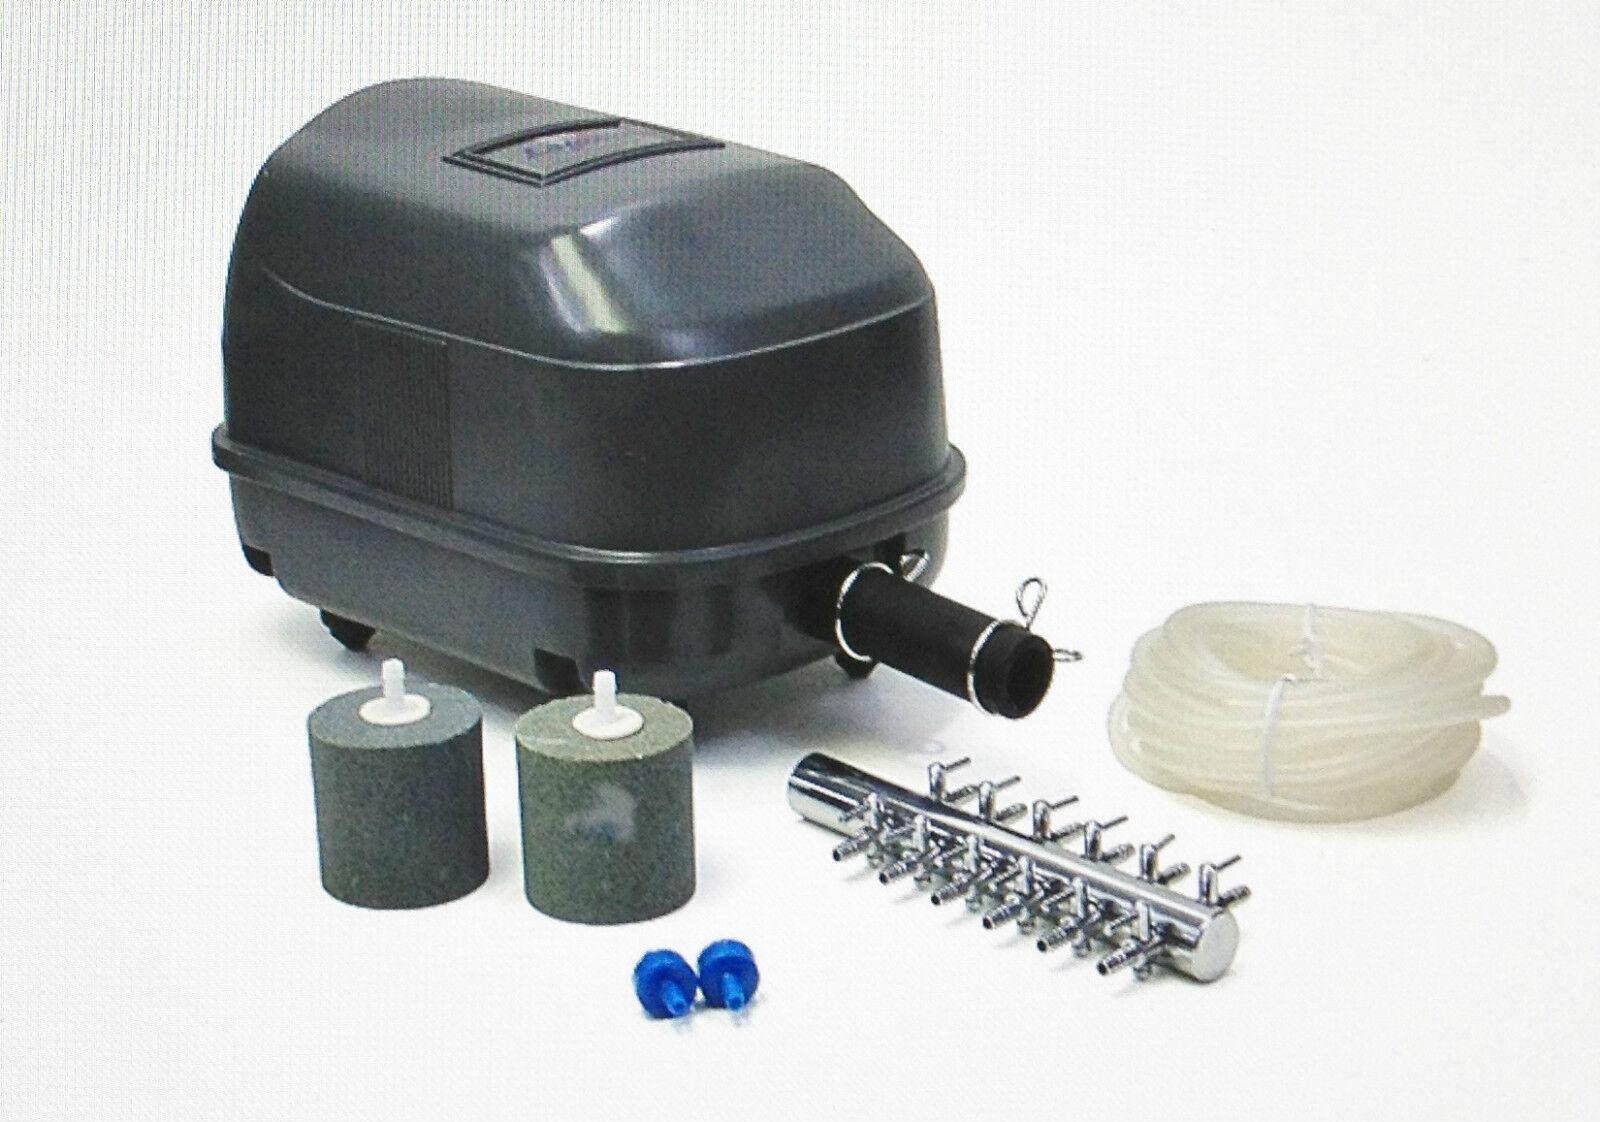 Laguna air pump kit 45 pt 1620 max operating depth 9 for Pond pump kit